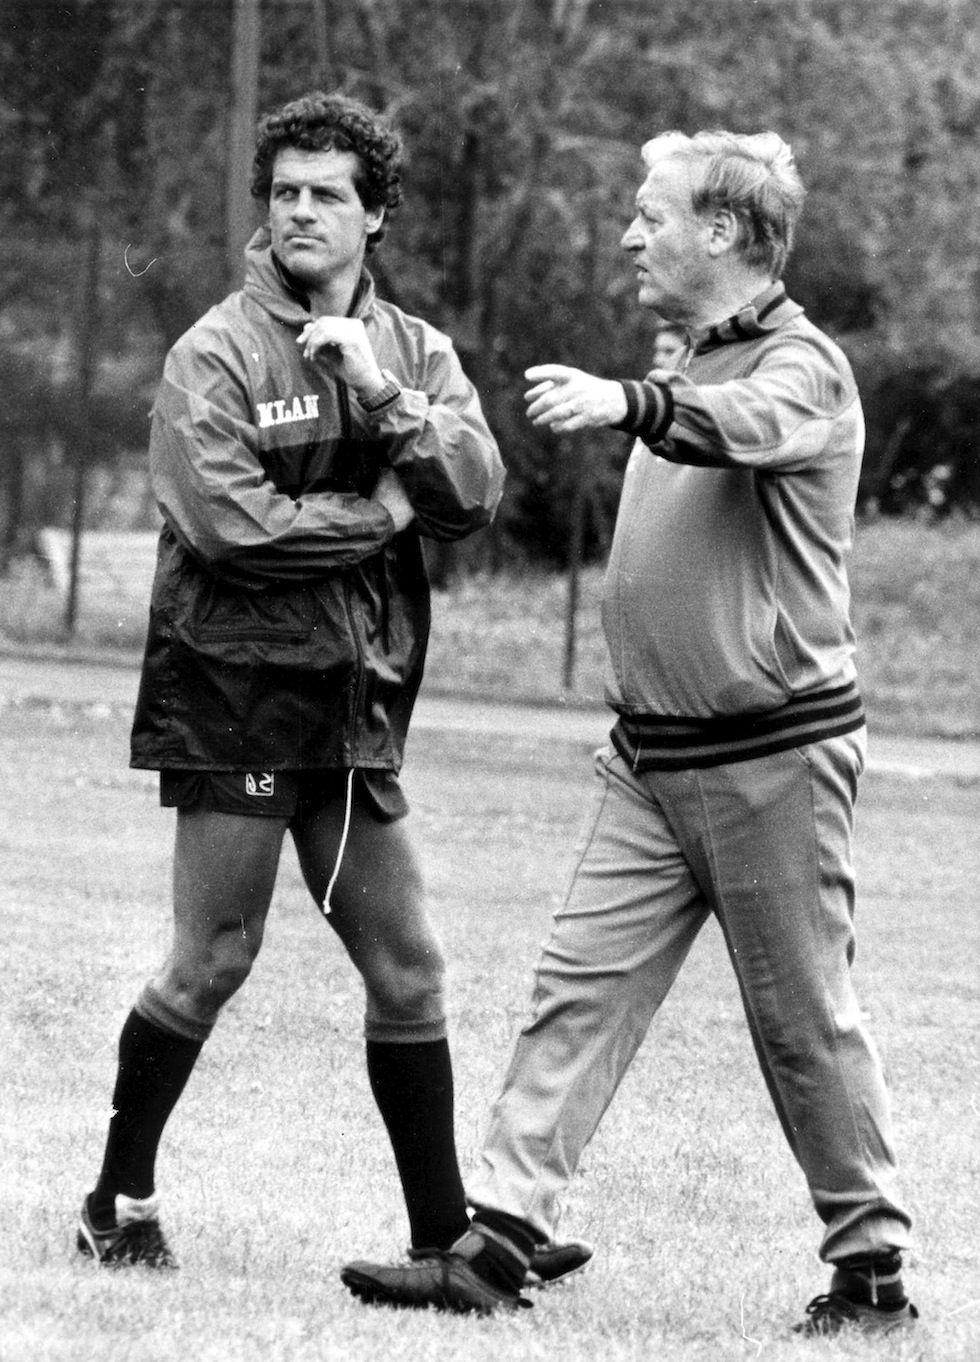 Fabio Capello AC Milan caretaker 1987 AC Milan coach 1991–1996